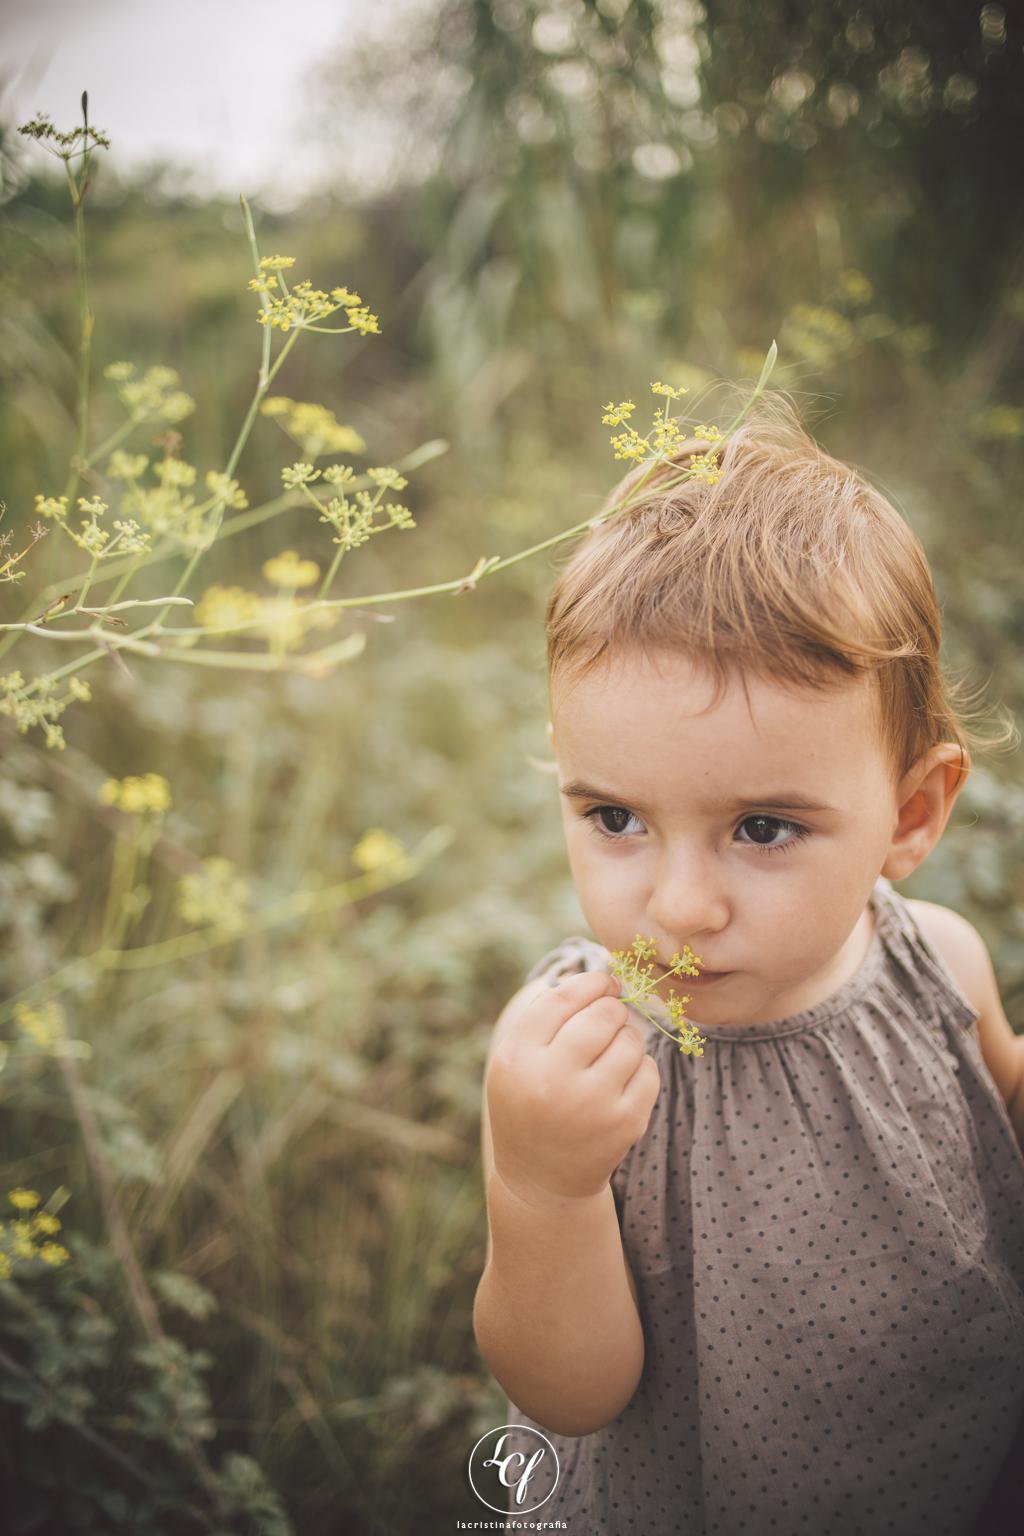 fotógrafo familiar sant cugat :: fotografo infantil sant cugat :: fotografía de familia :: fotografía infantl :: fotógrafo natural :: fotografía en el campo :: fotógrafo sant cugat